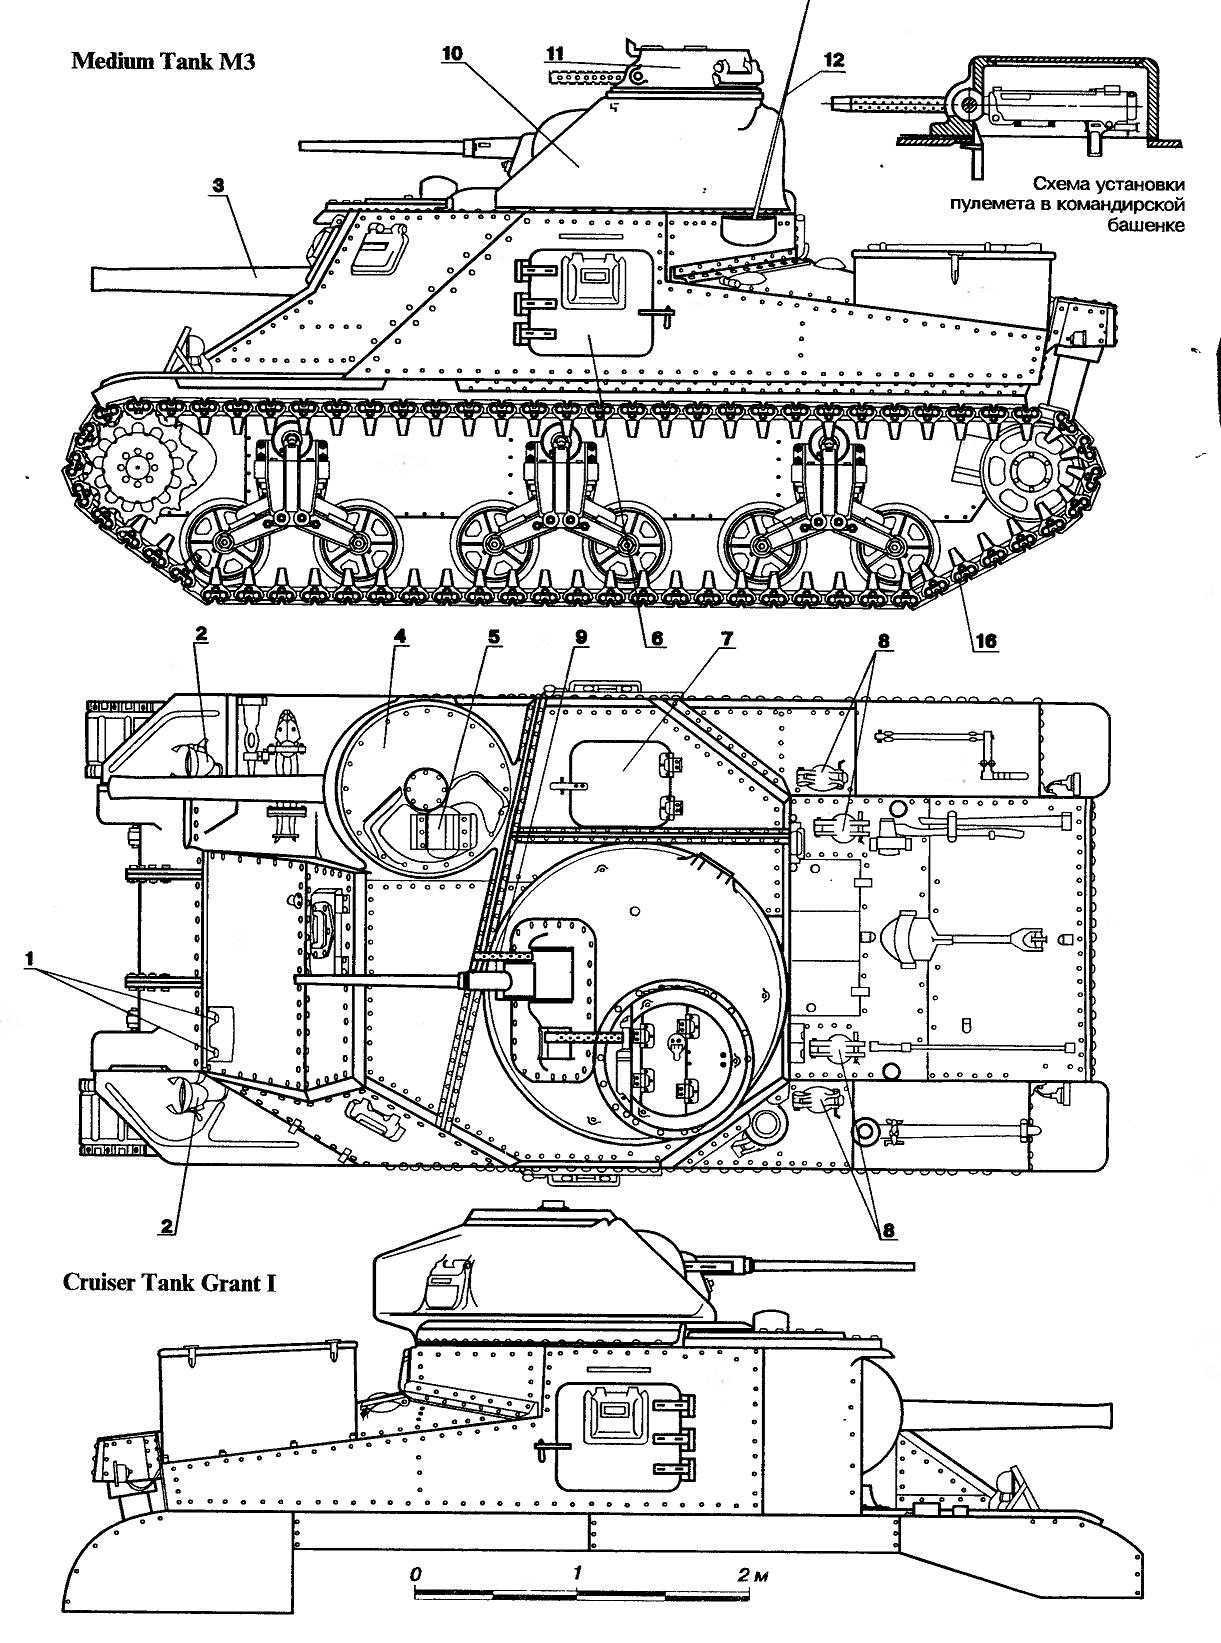 Medium Tank M 3 Lee Grant